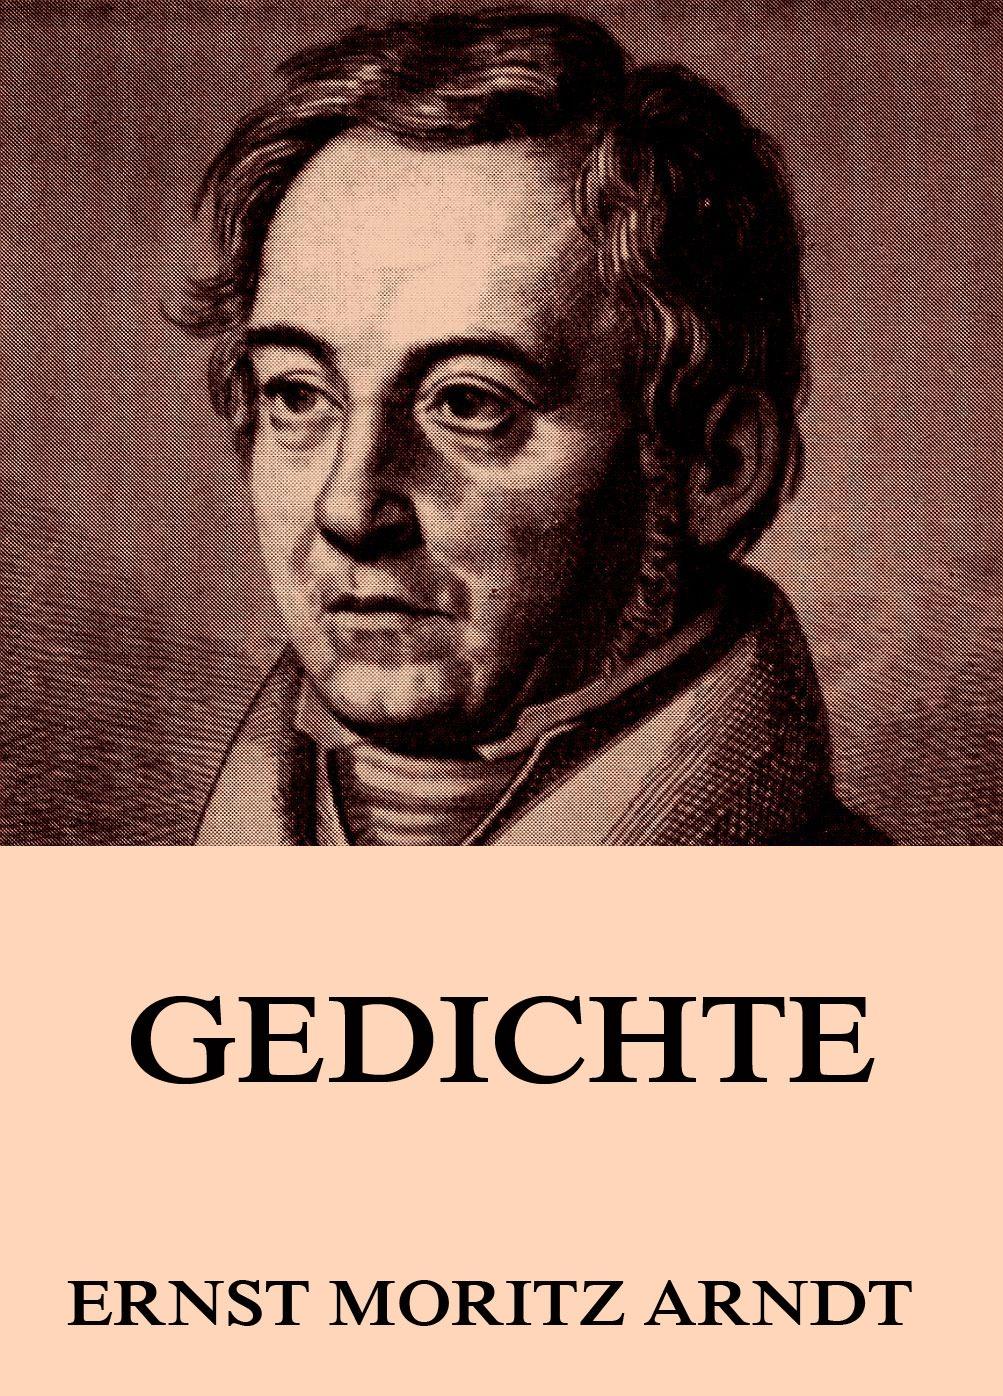 Ernst Moritz Arndt Gedichte aare kristoforos arndt mõranenud helbed